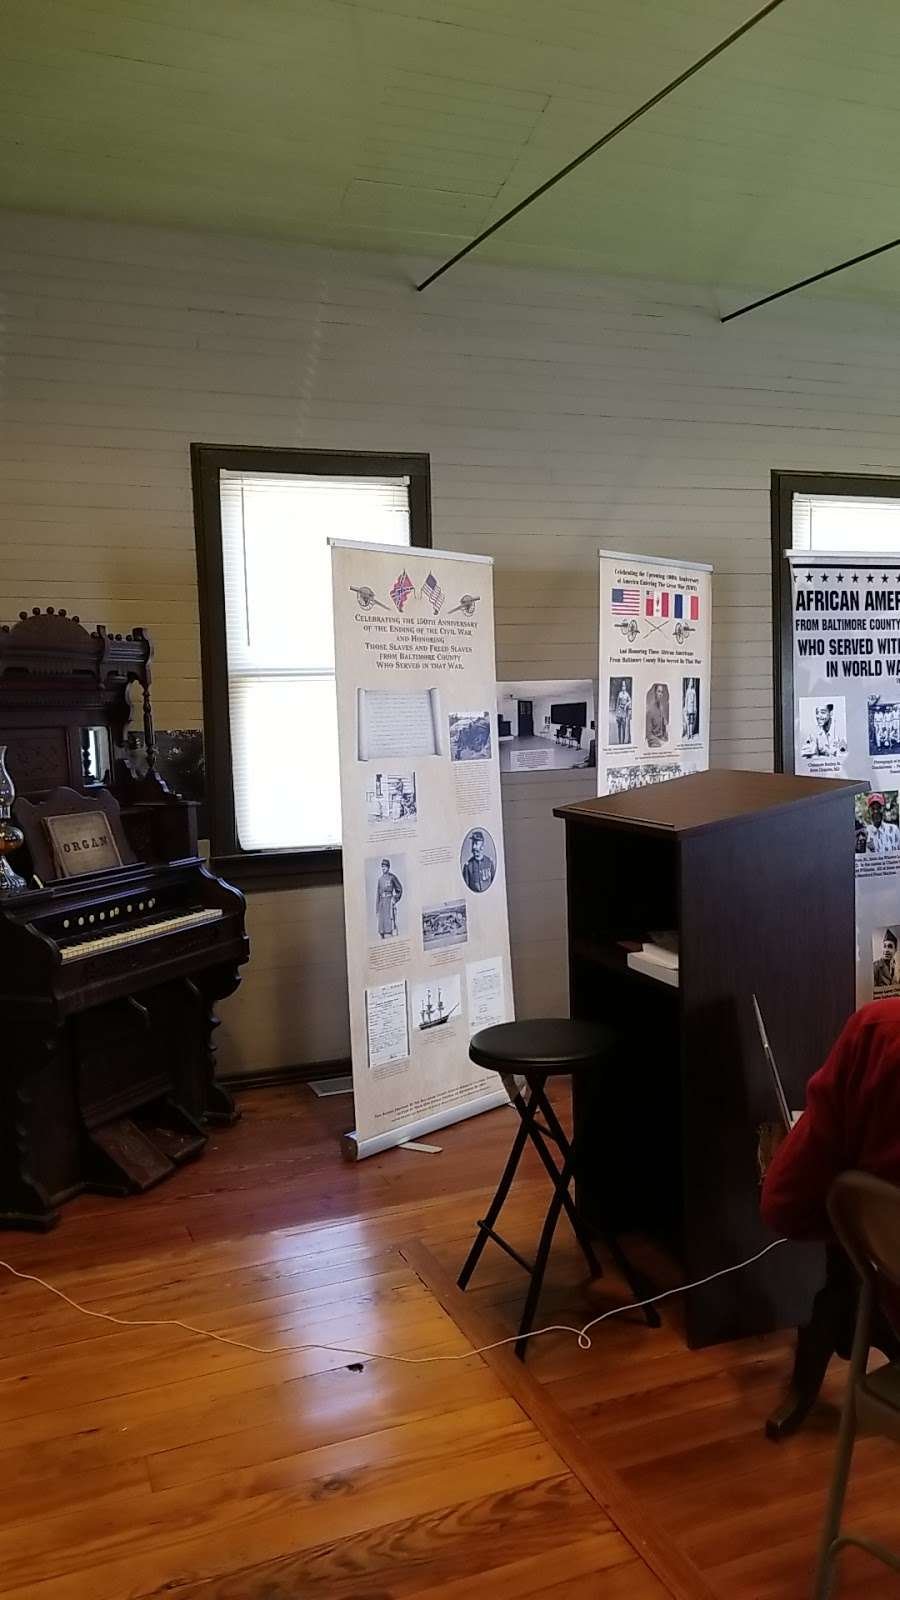 Diggs Johnson Museum - museum  | Photo 1 of 5 | Address: 2426 Offutt Rd, Woodstock, MD 21163, USA | Phone: (443) 675-7282